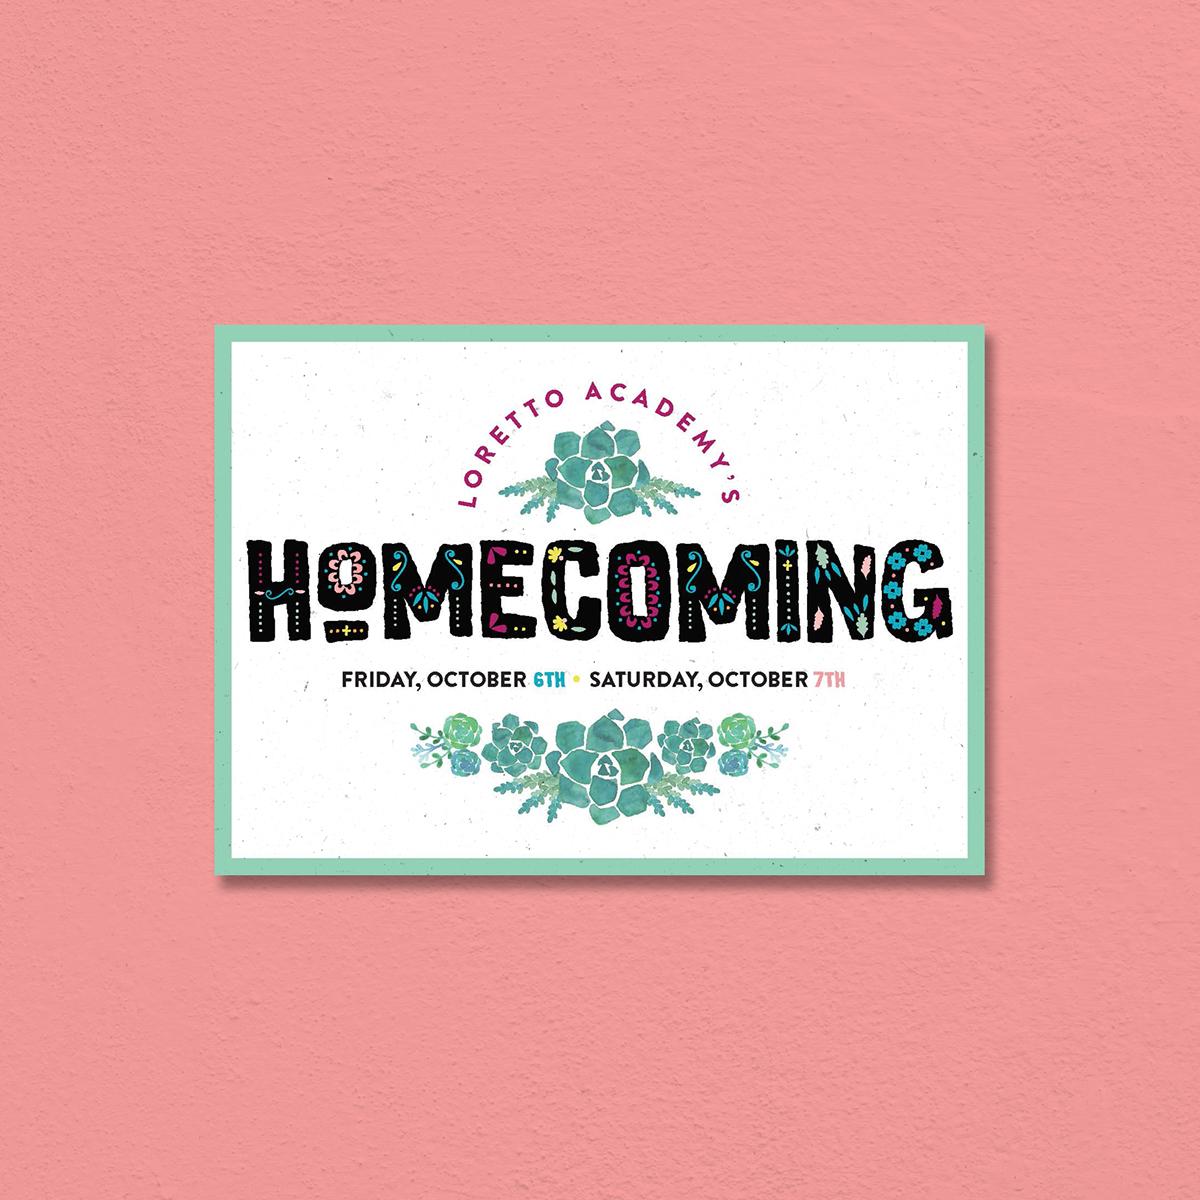 Loretto Homecoming Invitation on Behance